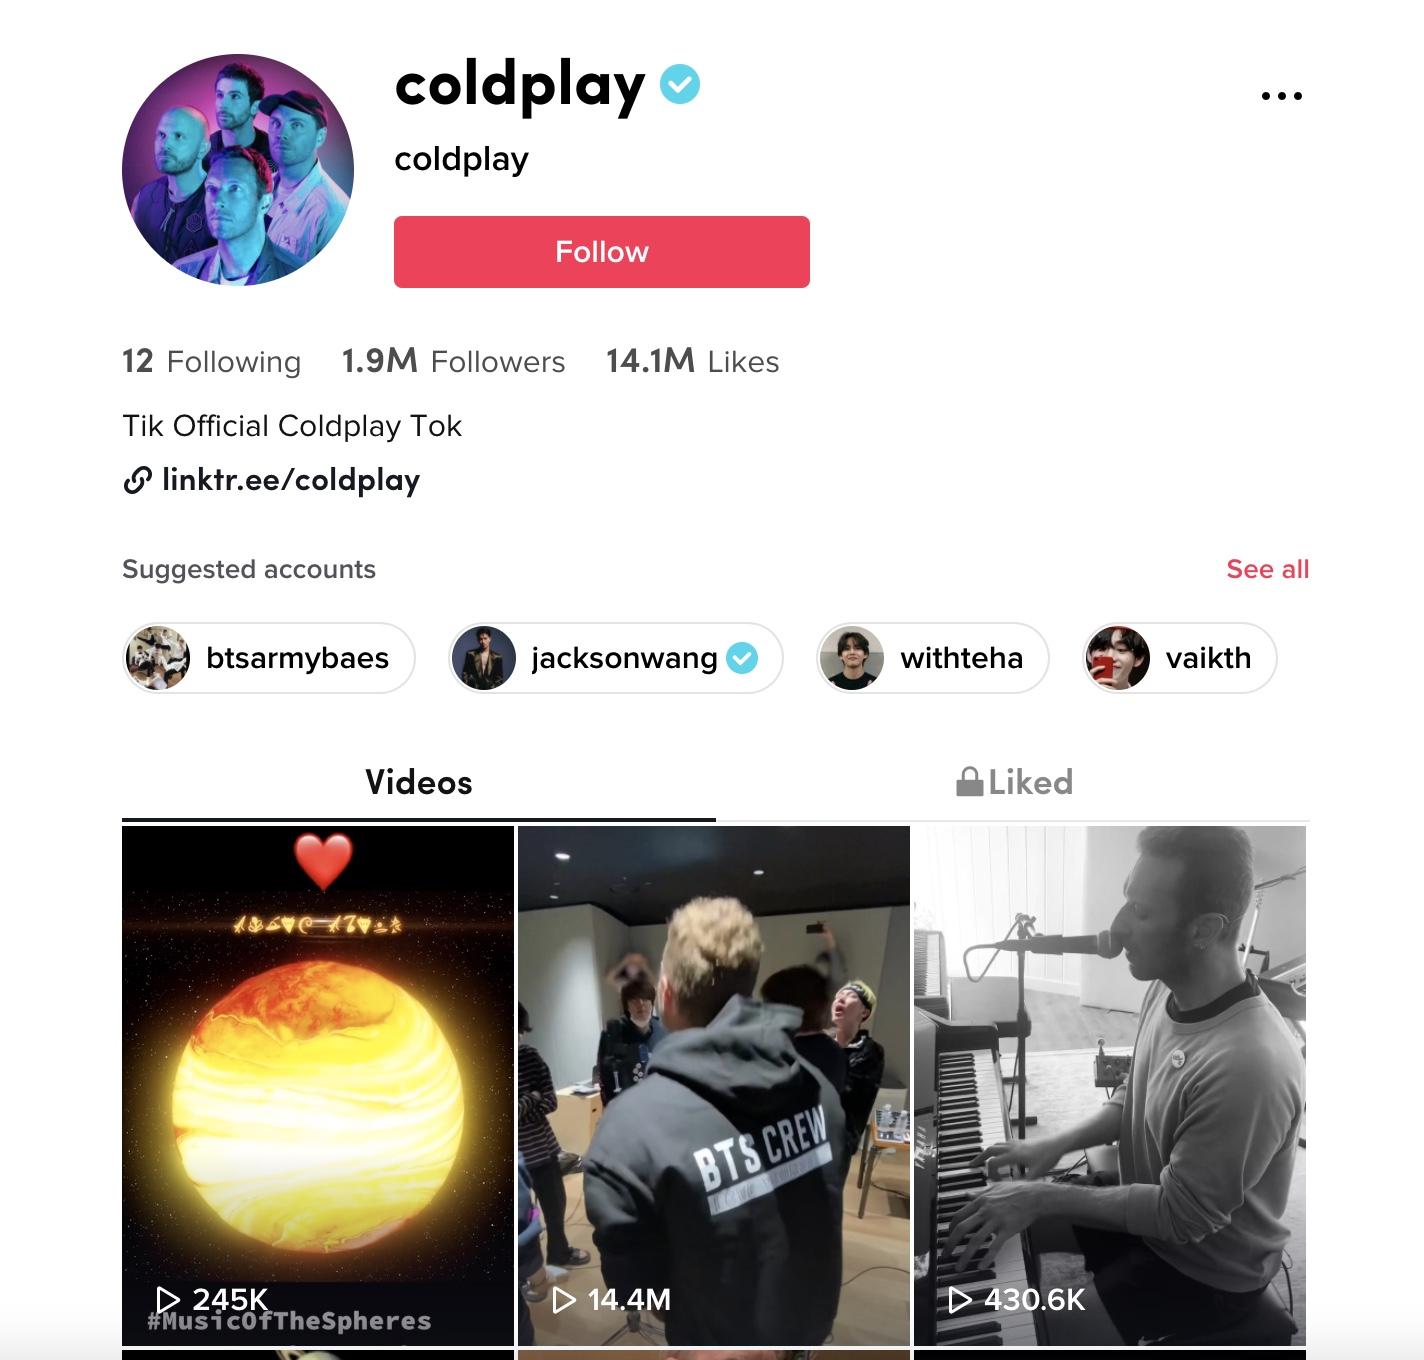 coldplay musicians on tiktok